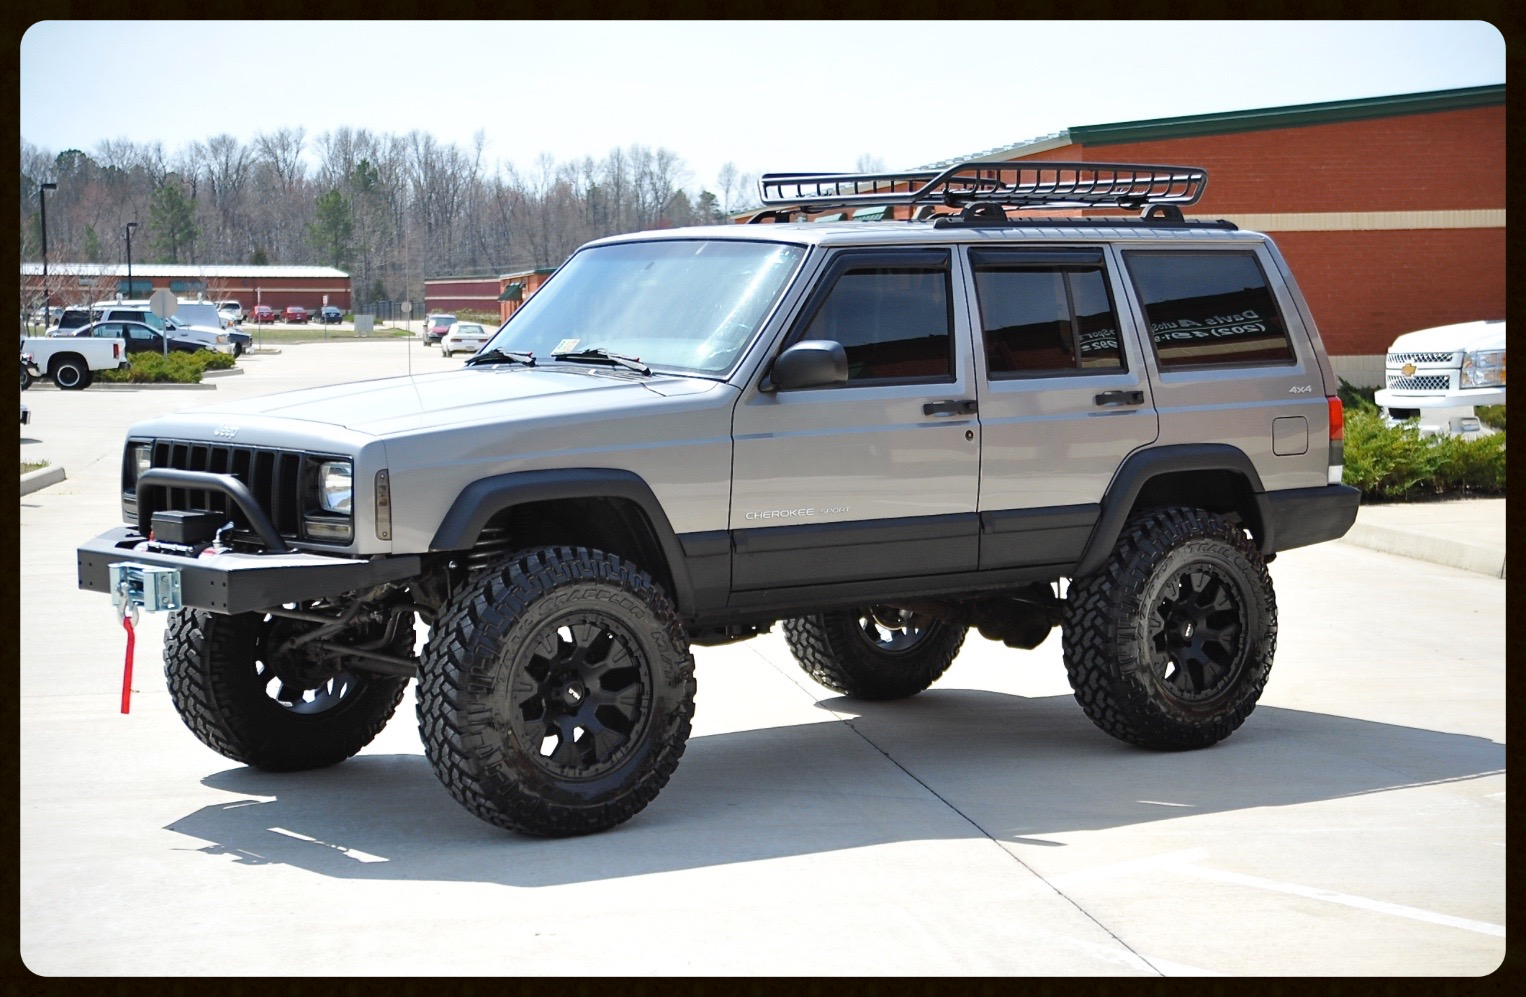 Lifted Cherokee Xj For Sale Jeep Cherokee Lifted For Sale Davis Autosports Davis Autosports